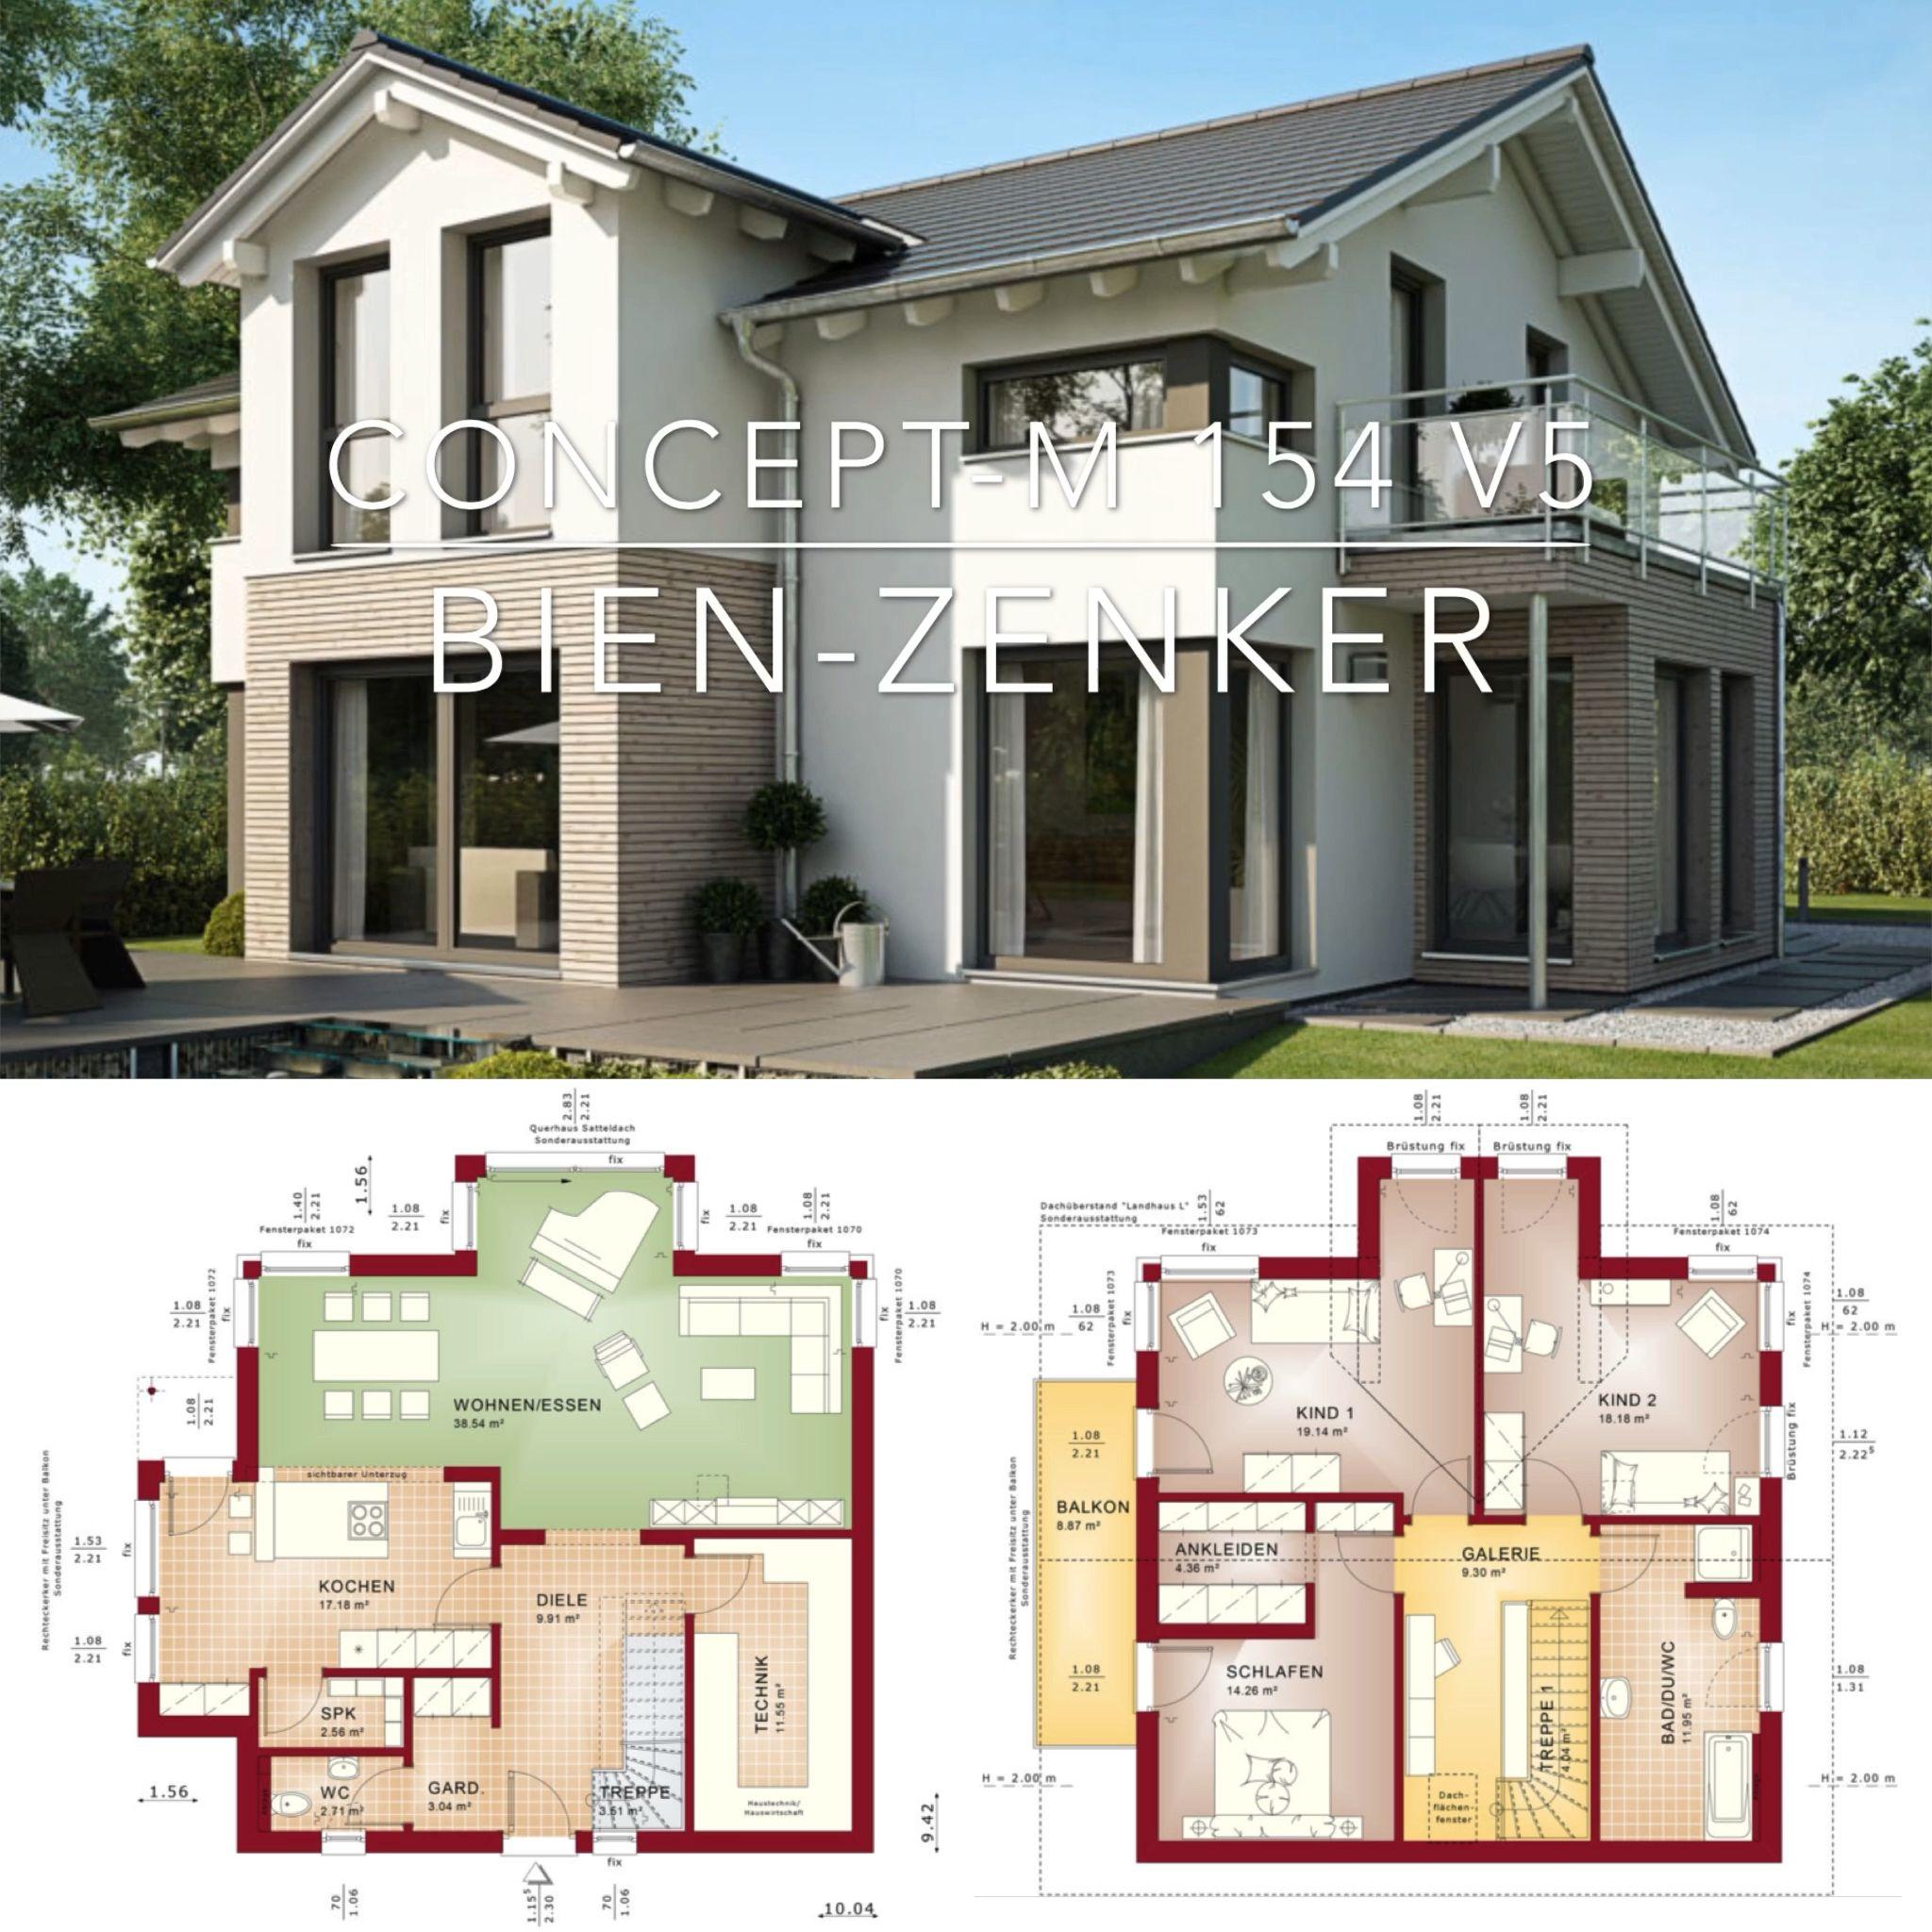 Photo of European Architecture House Plan & Interior Design Ideas – Concept-M 154 V5